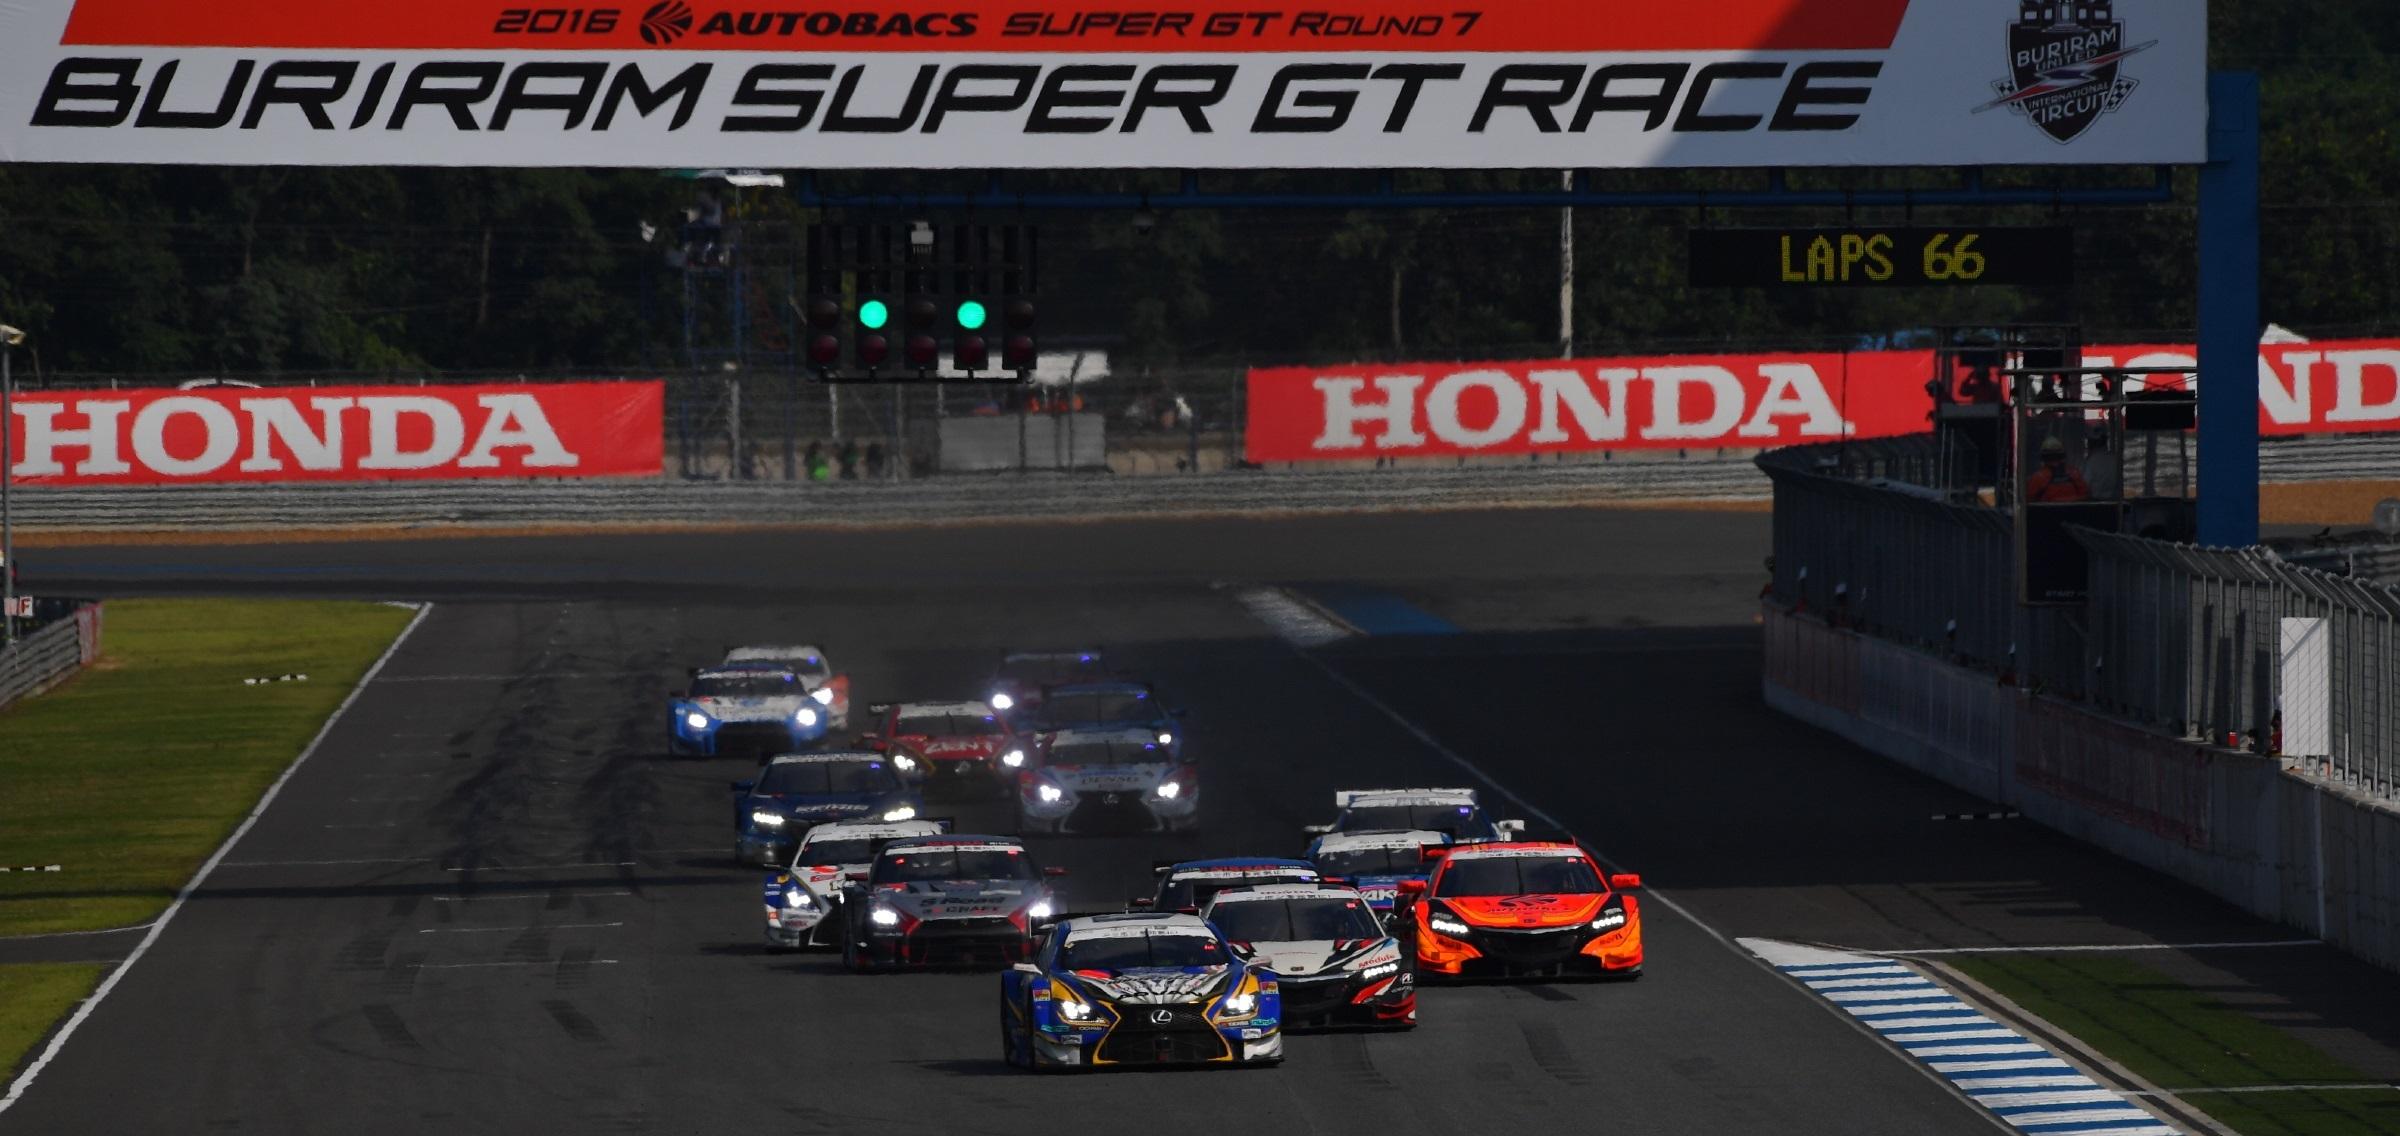 Salida Super GT Buriram 2016